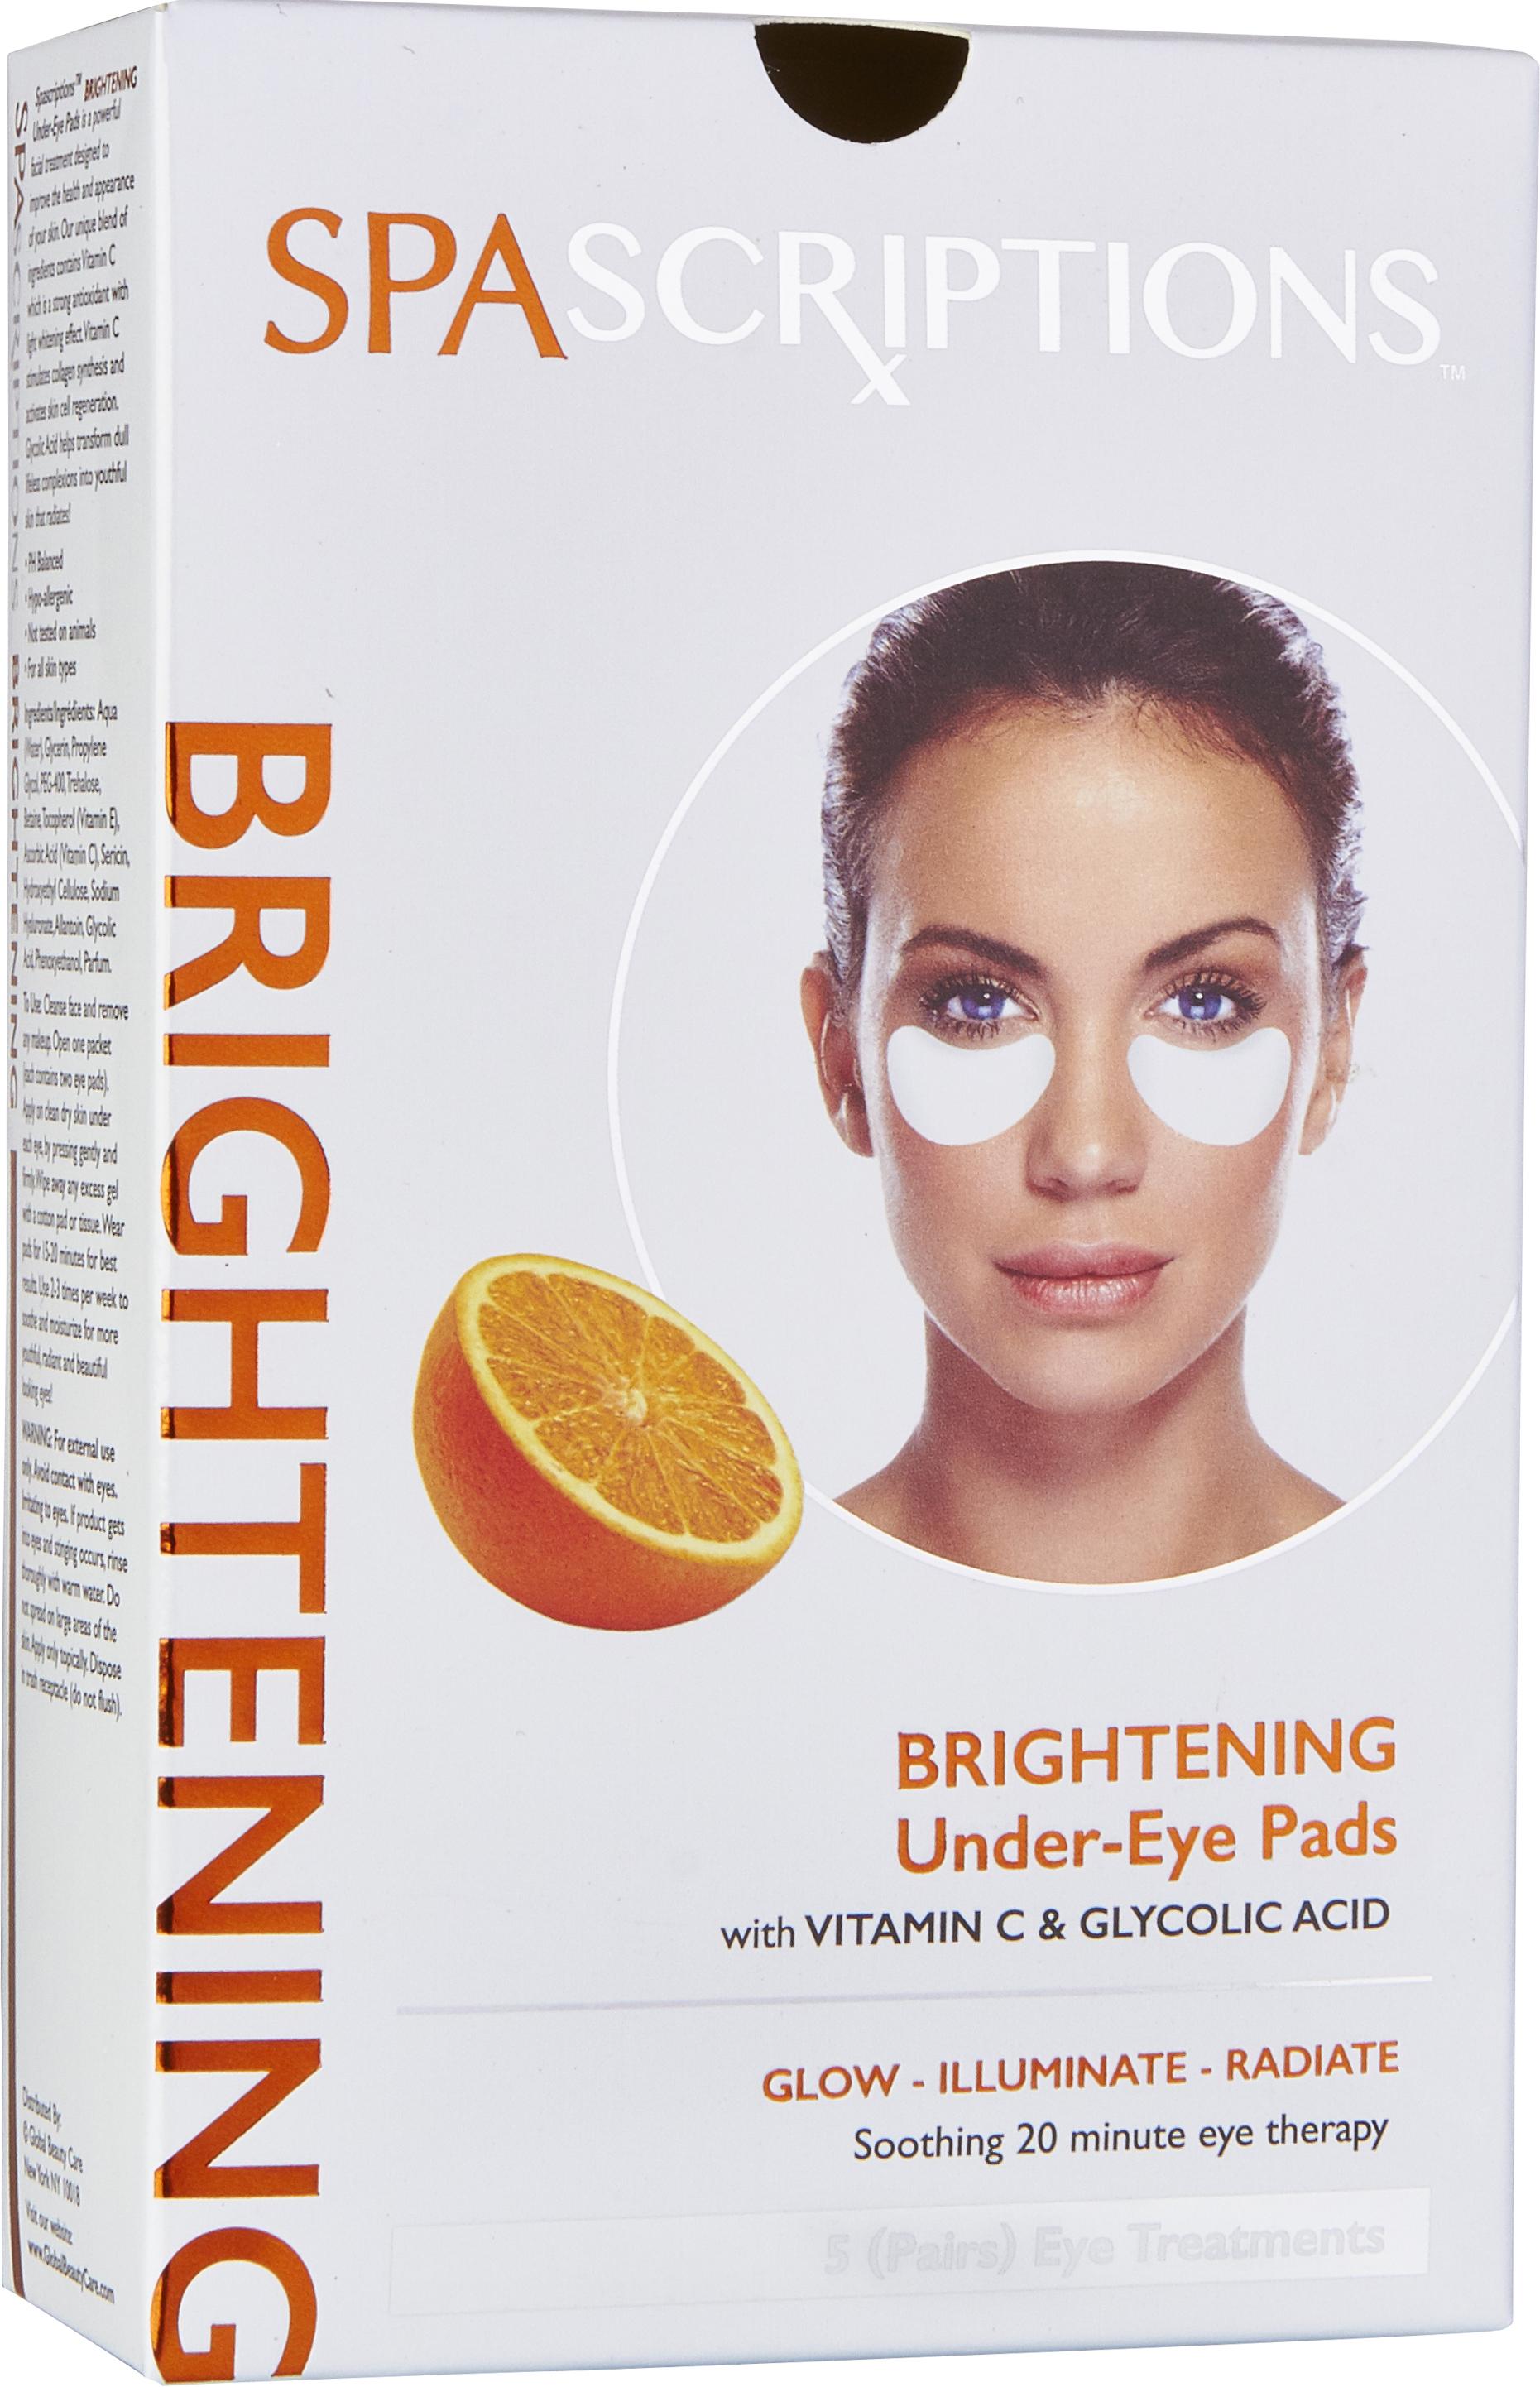 Spascriptions Brightening Under Eye Pads